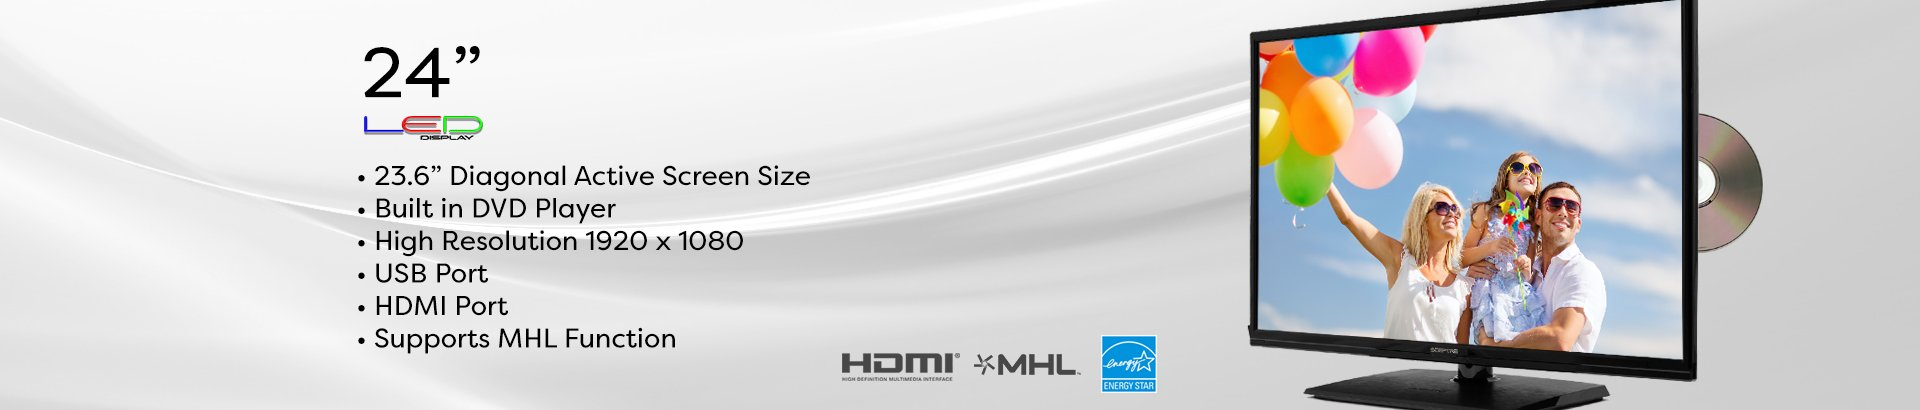 Sceptre 24'' 1080P LED HDTV DVD Combo E249BD-FMQC MHL Ready, Metal Black by Sceptre